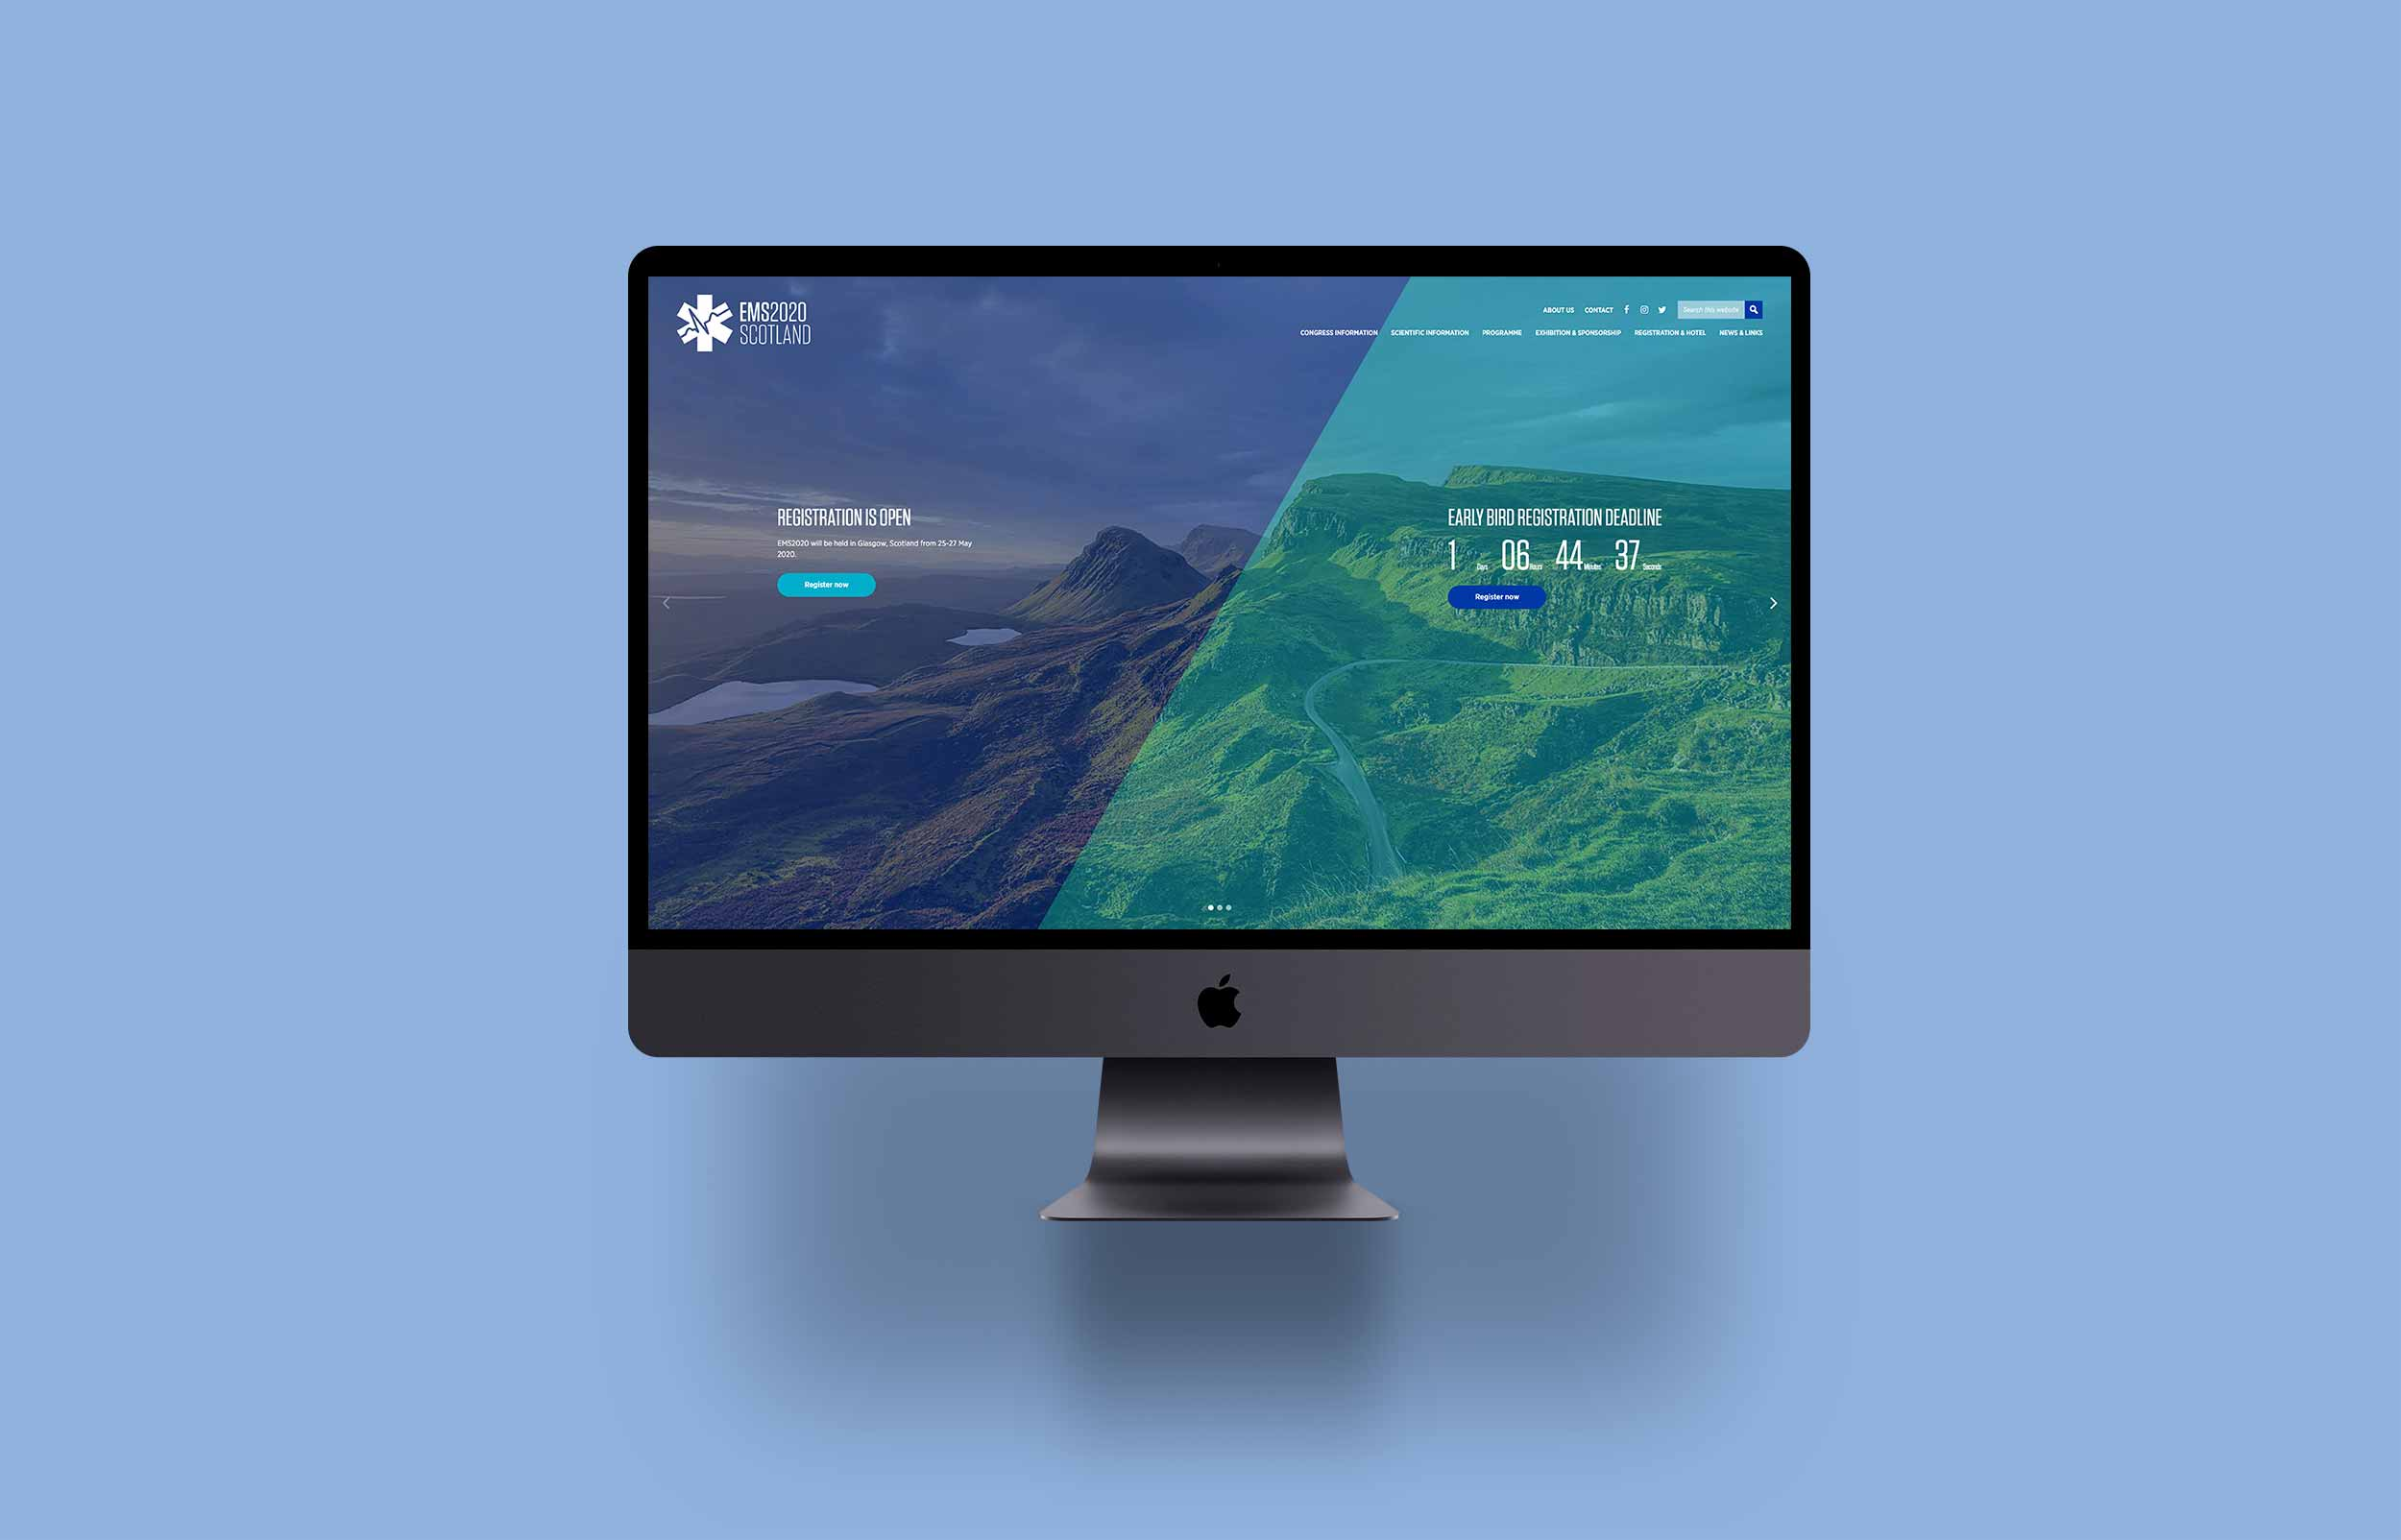 EMS Europe website on iMac